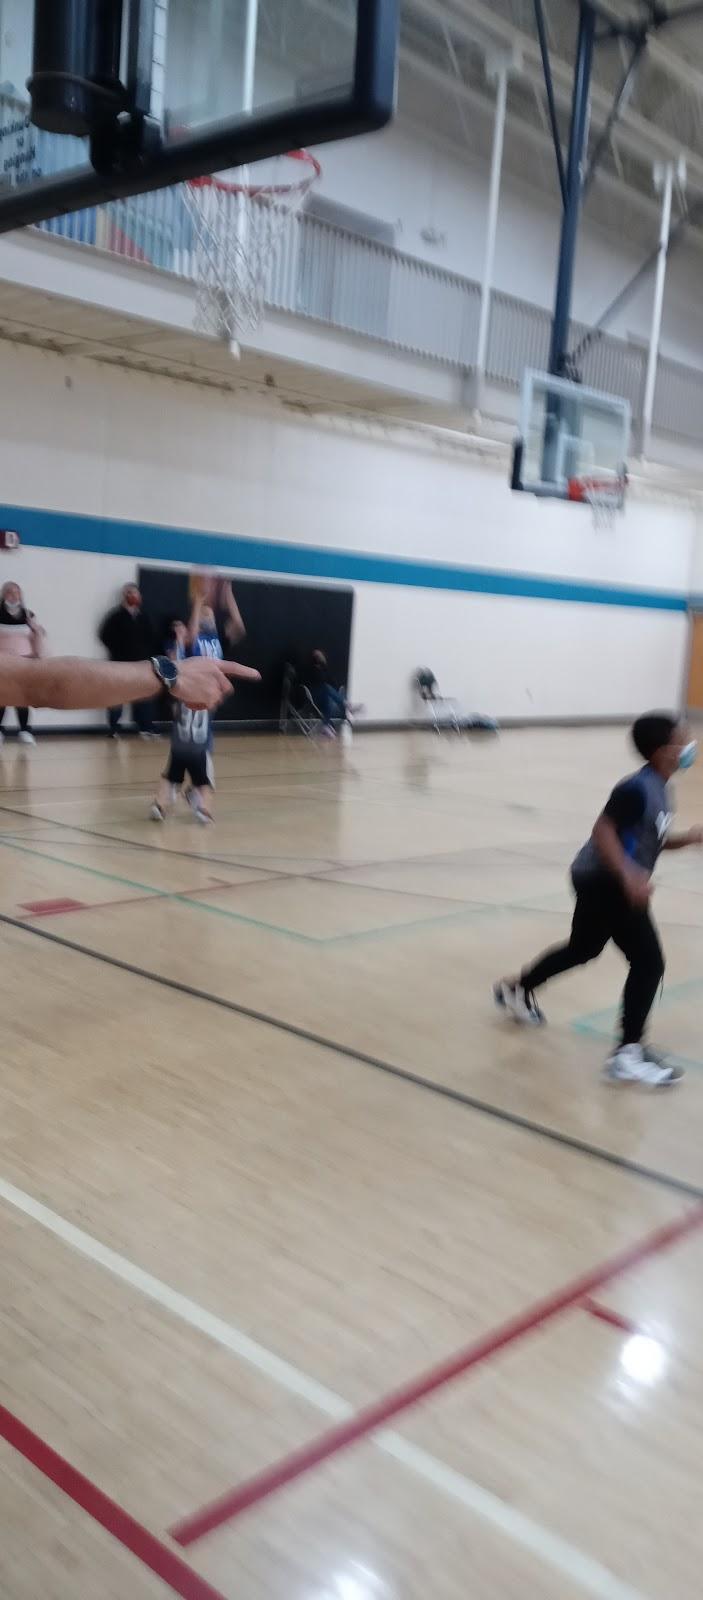 YMCA - Coon Rapids - gym  | Photo 1 of 2 | Address: 8950 Springbrook Dr NW, Coon Rapids, MN 55433, USA | Phone: (763) 785-7882